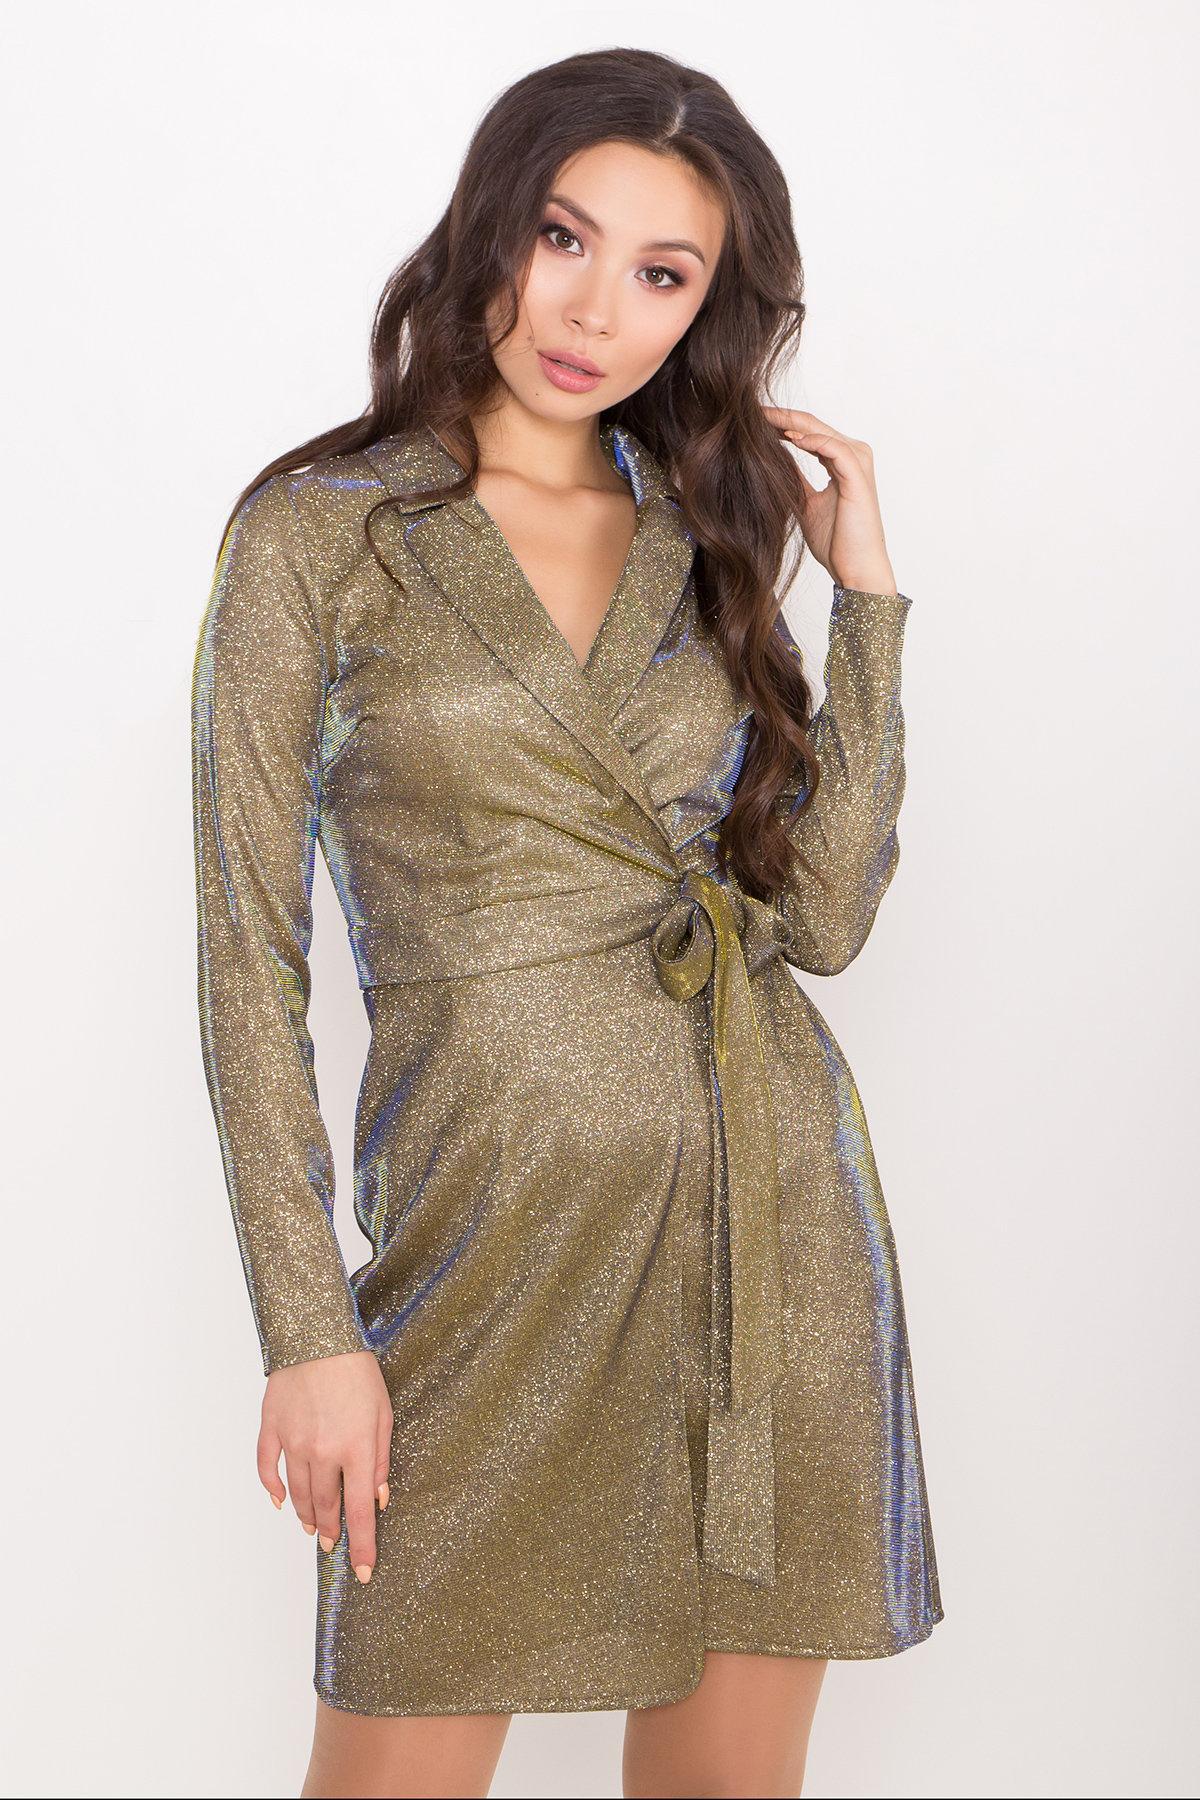 Платье Шати 8686 АРТ. 45015 Цвет: Золото/электрик - фото 3, интернет магазин tm-modus.ru